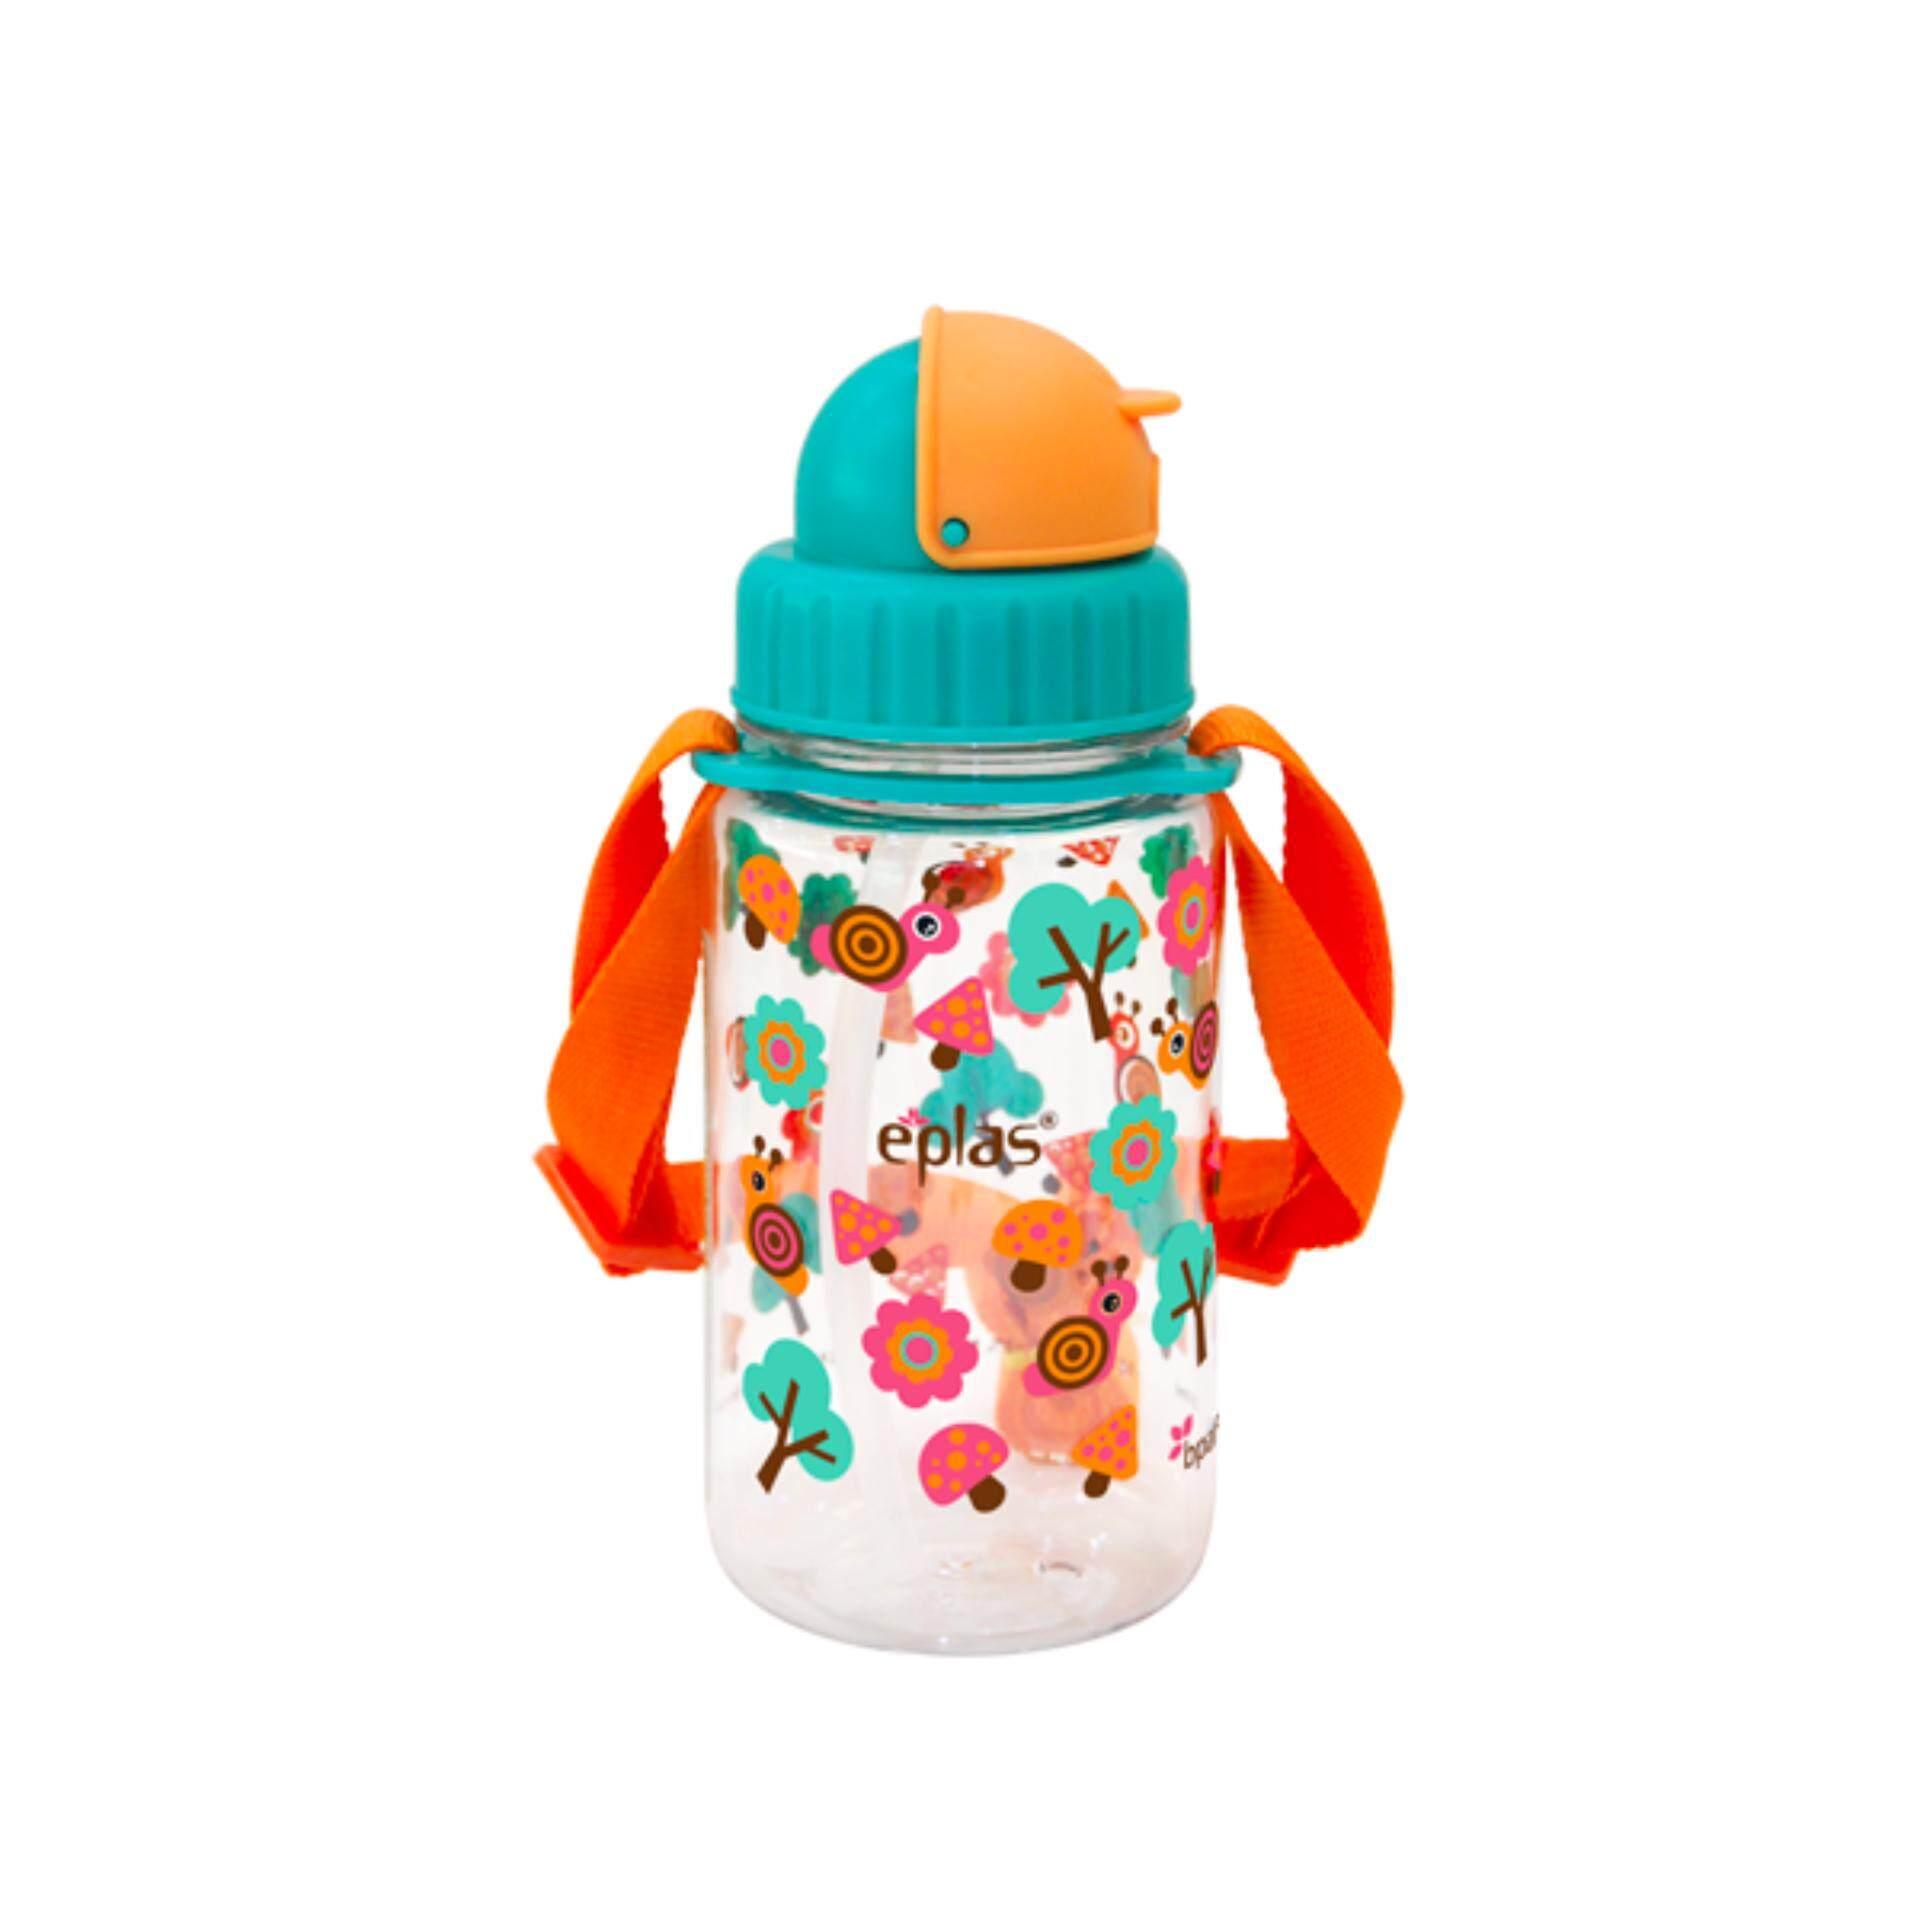 Eplas 350ml BPA Free Water Bottle with Straw